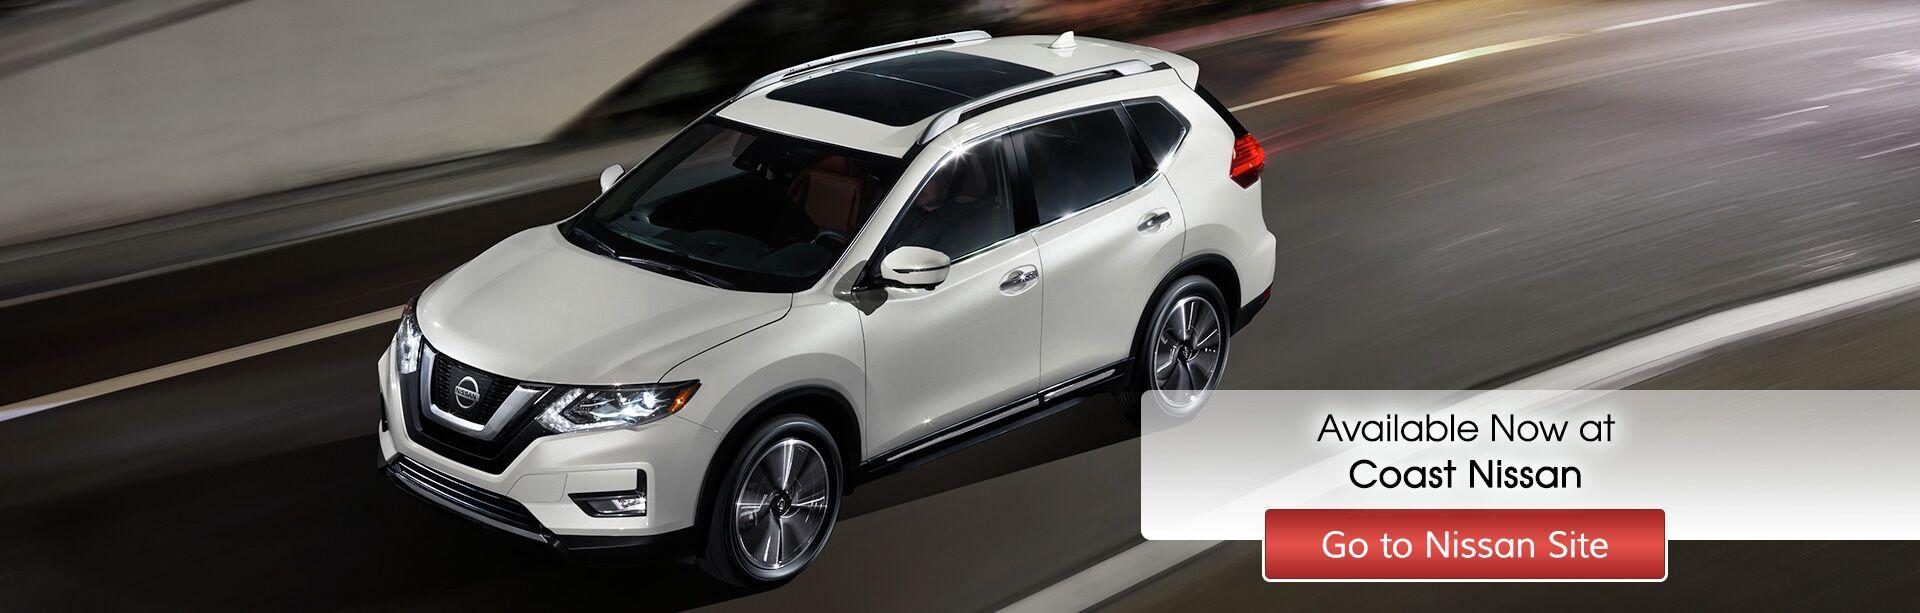 Volkswagen San Luis Obispo >> Cardinale Automotive Group Seaside CA | GMC Hyundai Mazda Nissan Toyota Volkswagen Dealers | GMC ...